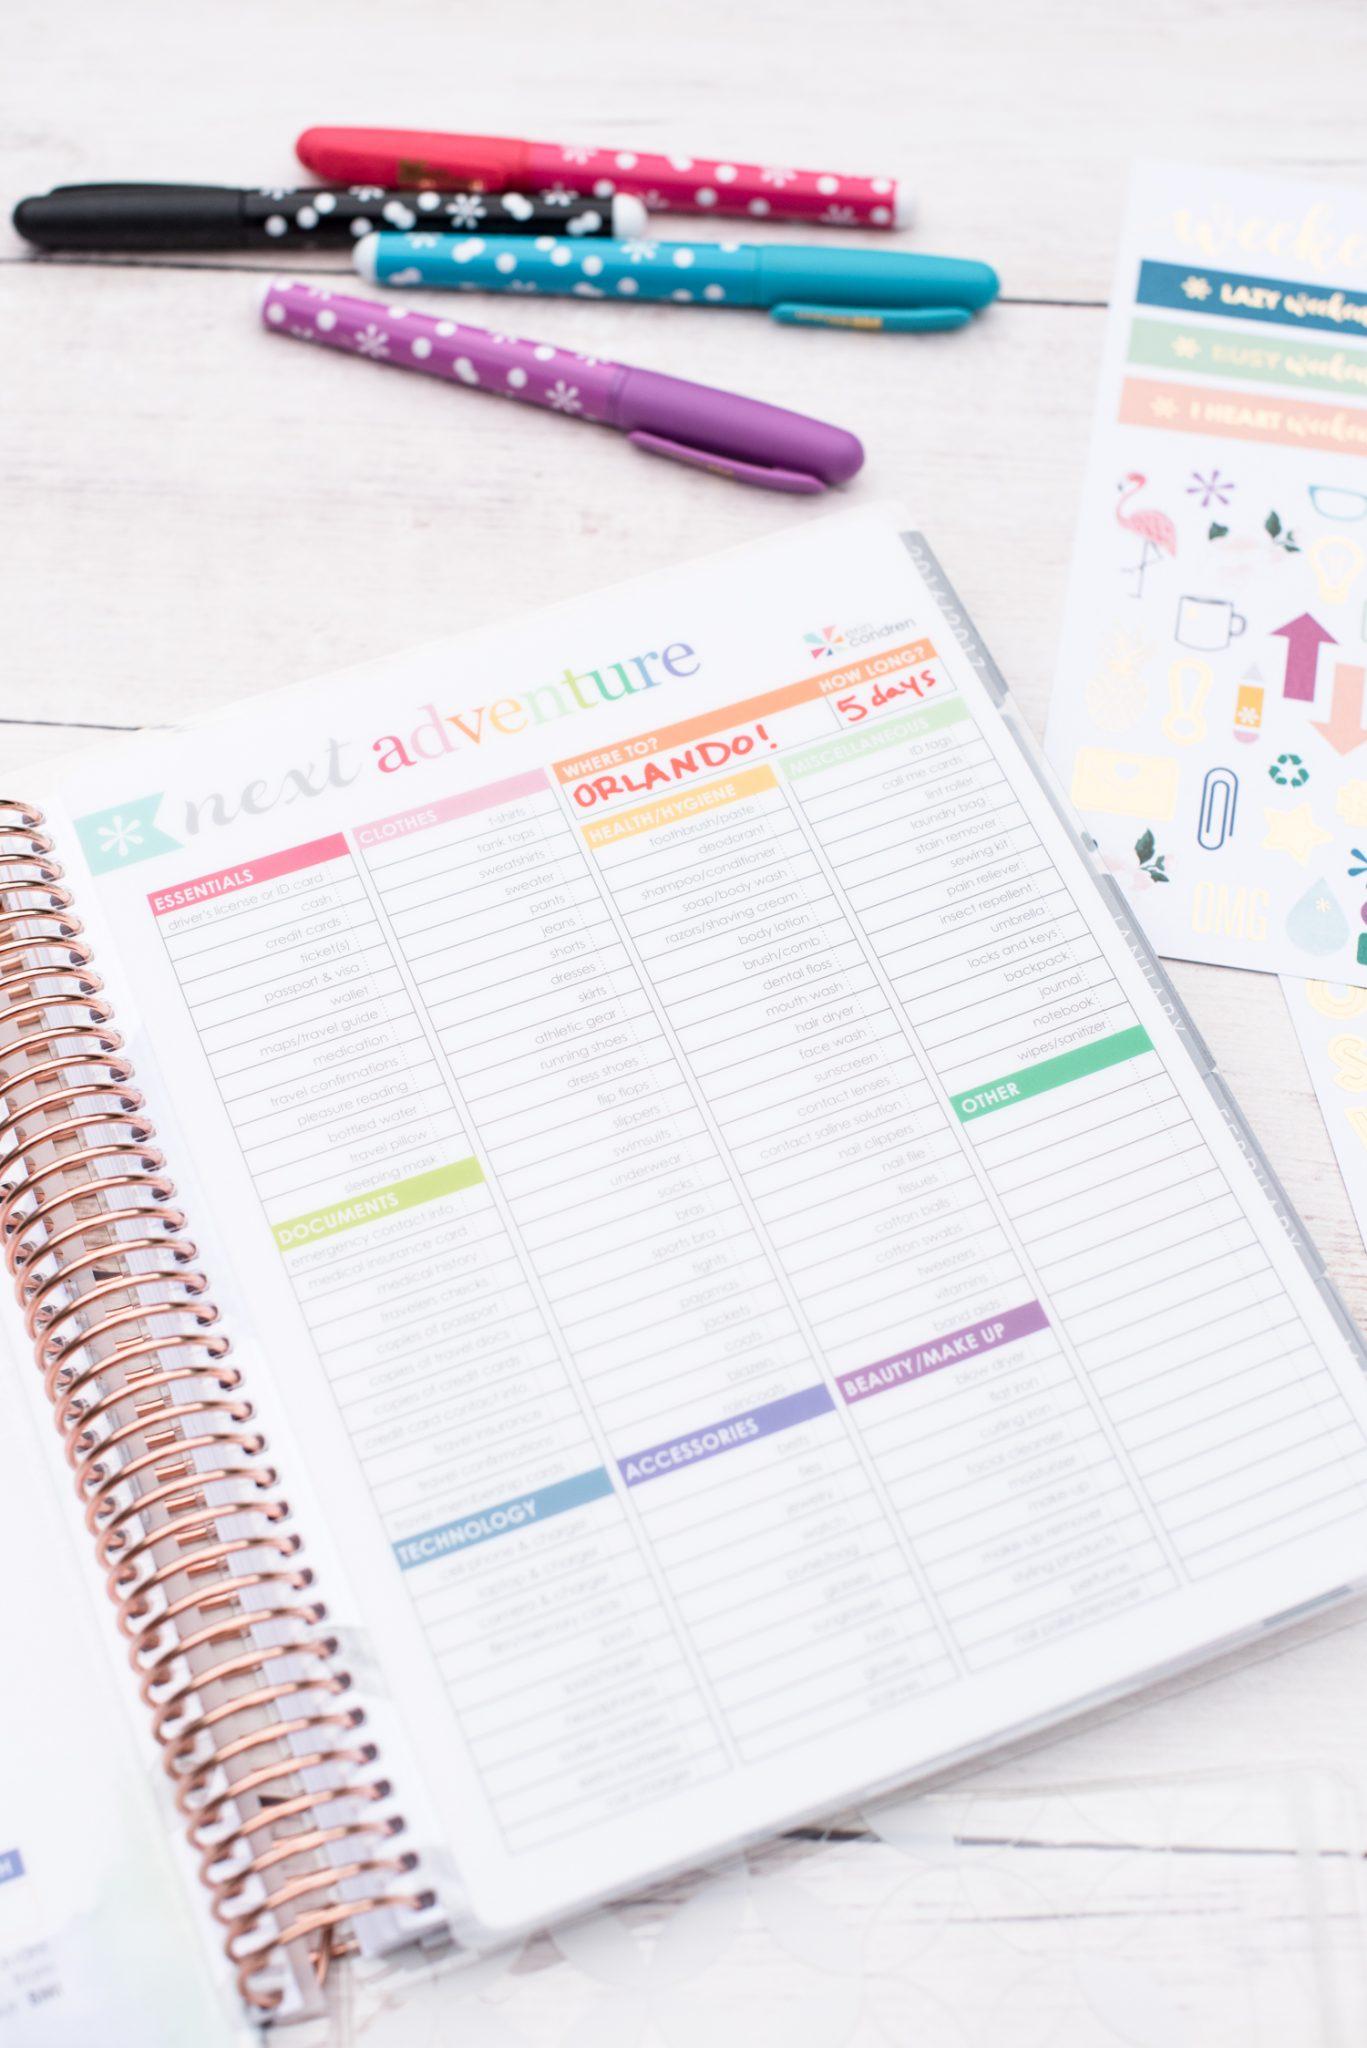 Getting Organized with the Erin Condren Life Planner via @missmollymoon